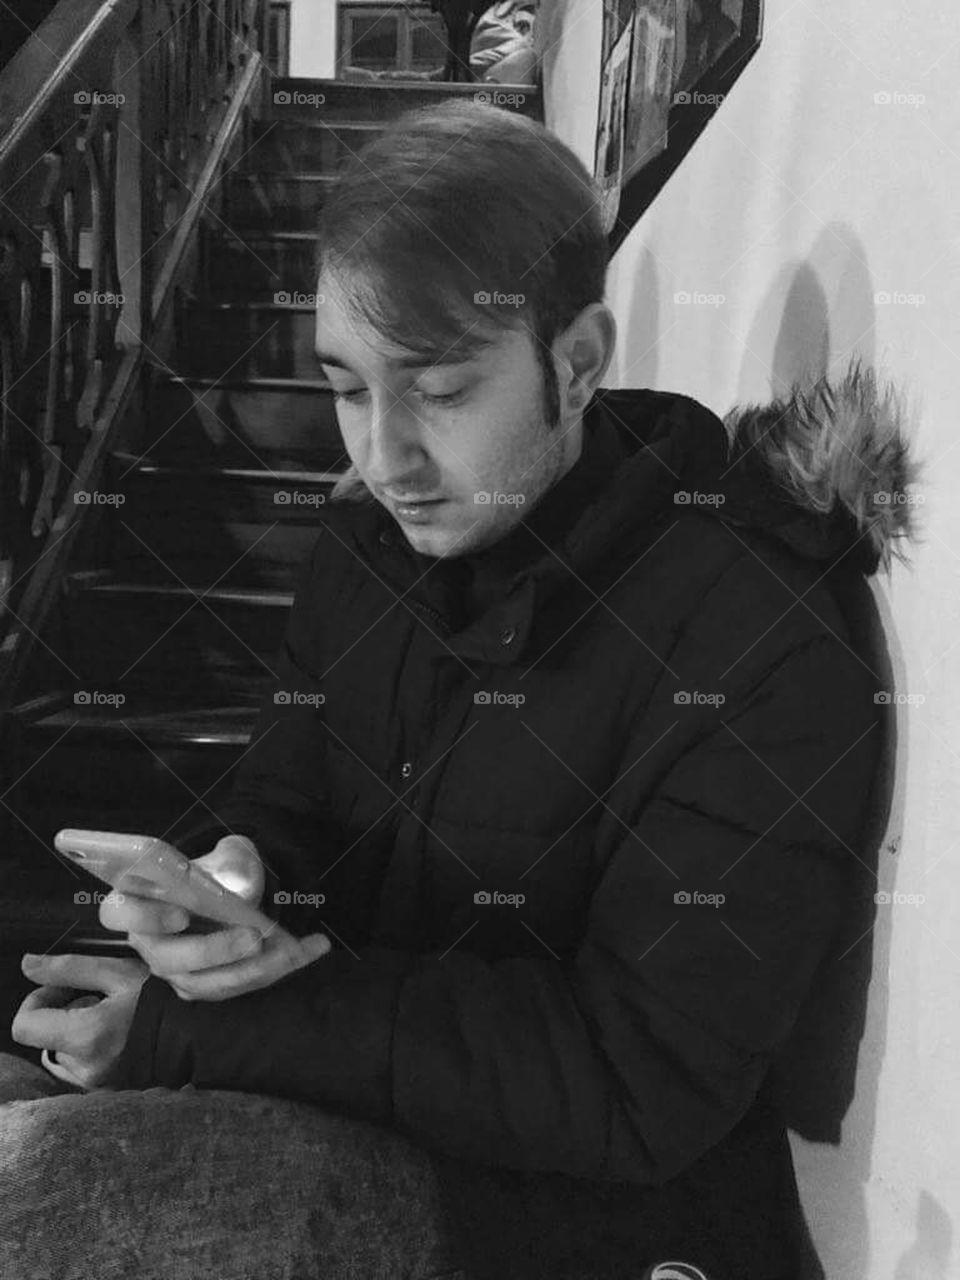 Boy using mobile phone.